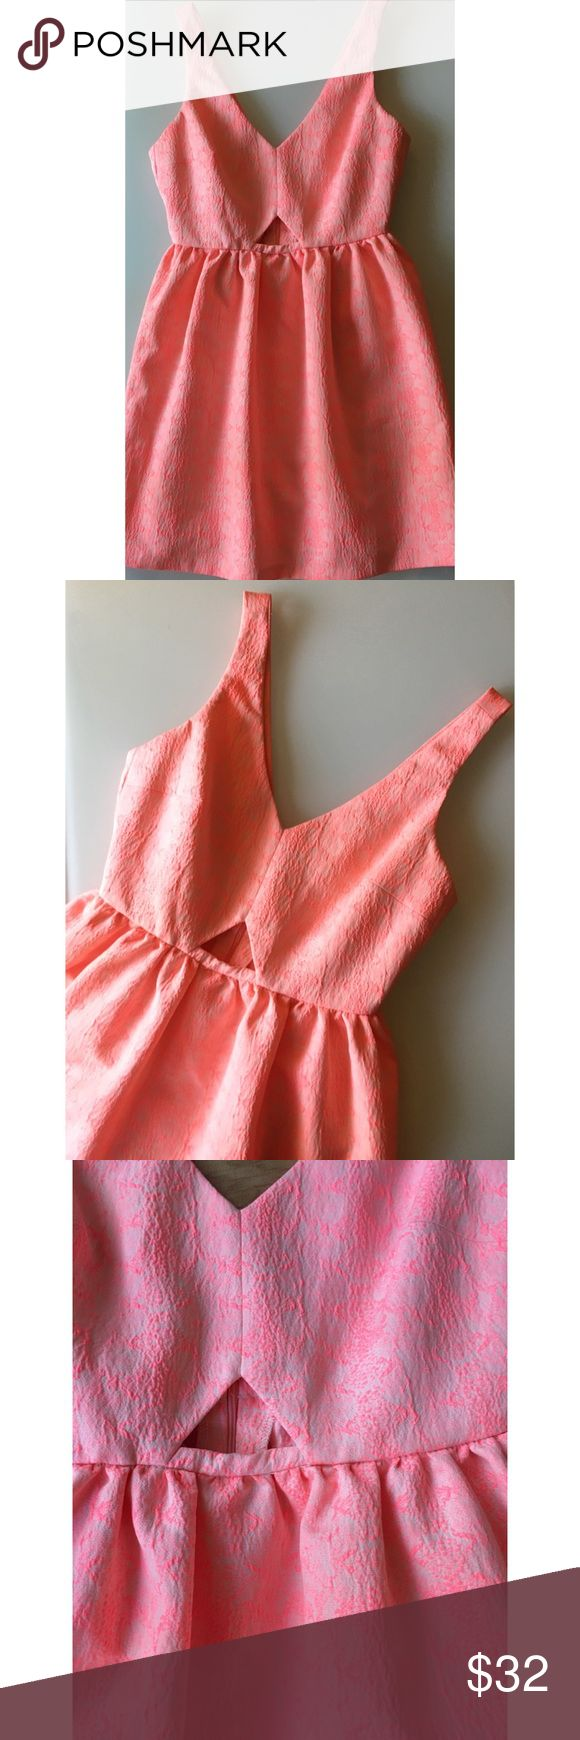 Zara Trafaluc pink coral cut out dress sz small Zara Trafaluc pink/ coral and white, textured,  cut out dress sz small. Worn twice. Great condition. Zara Dresses